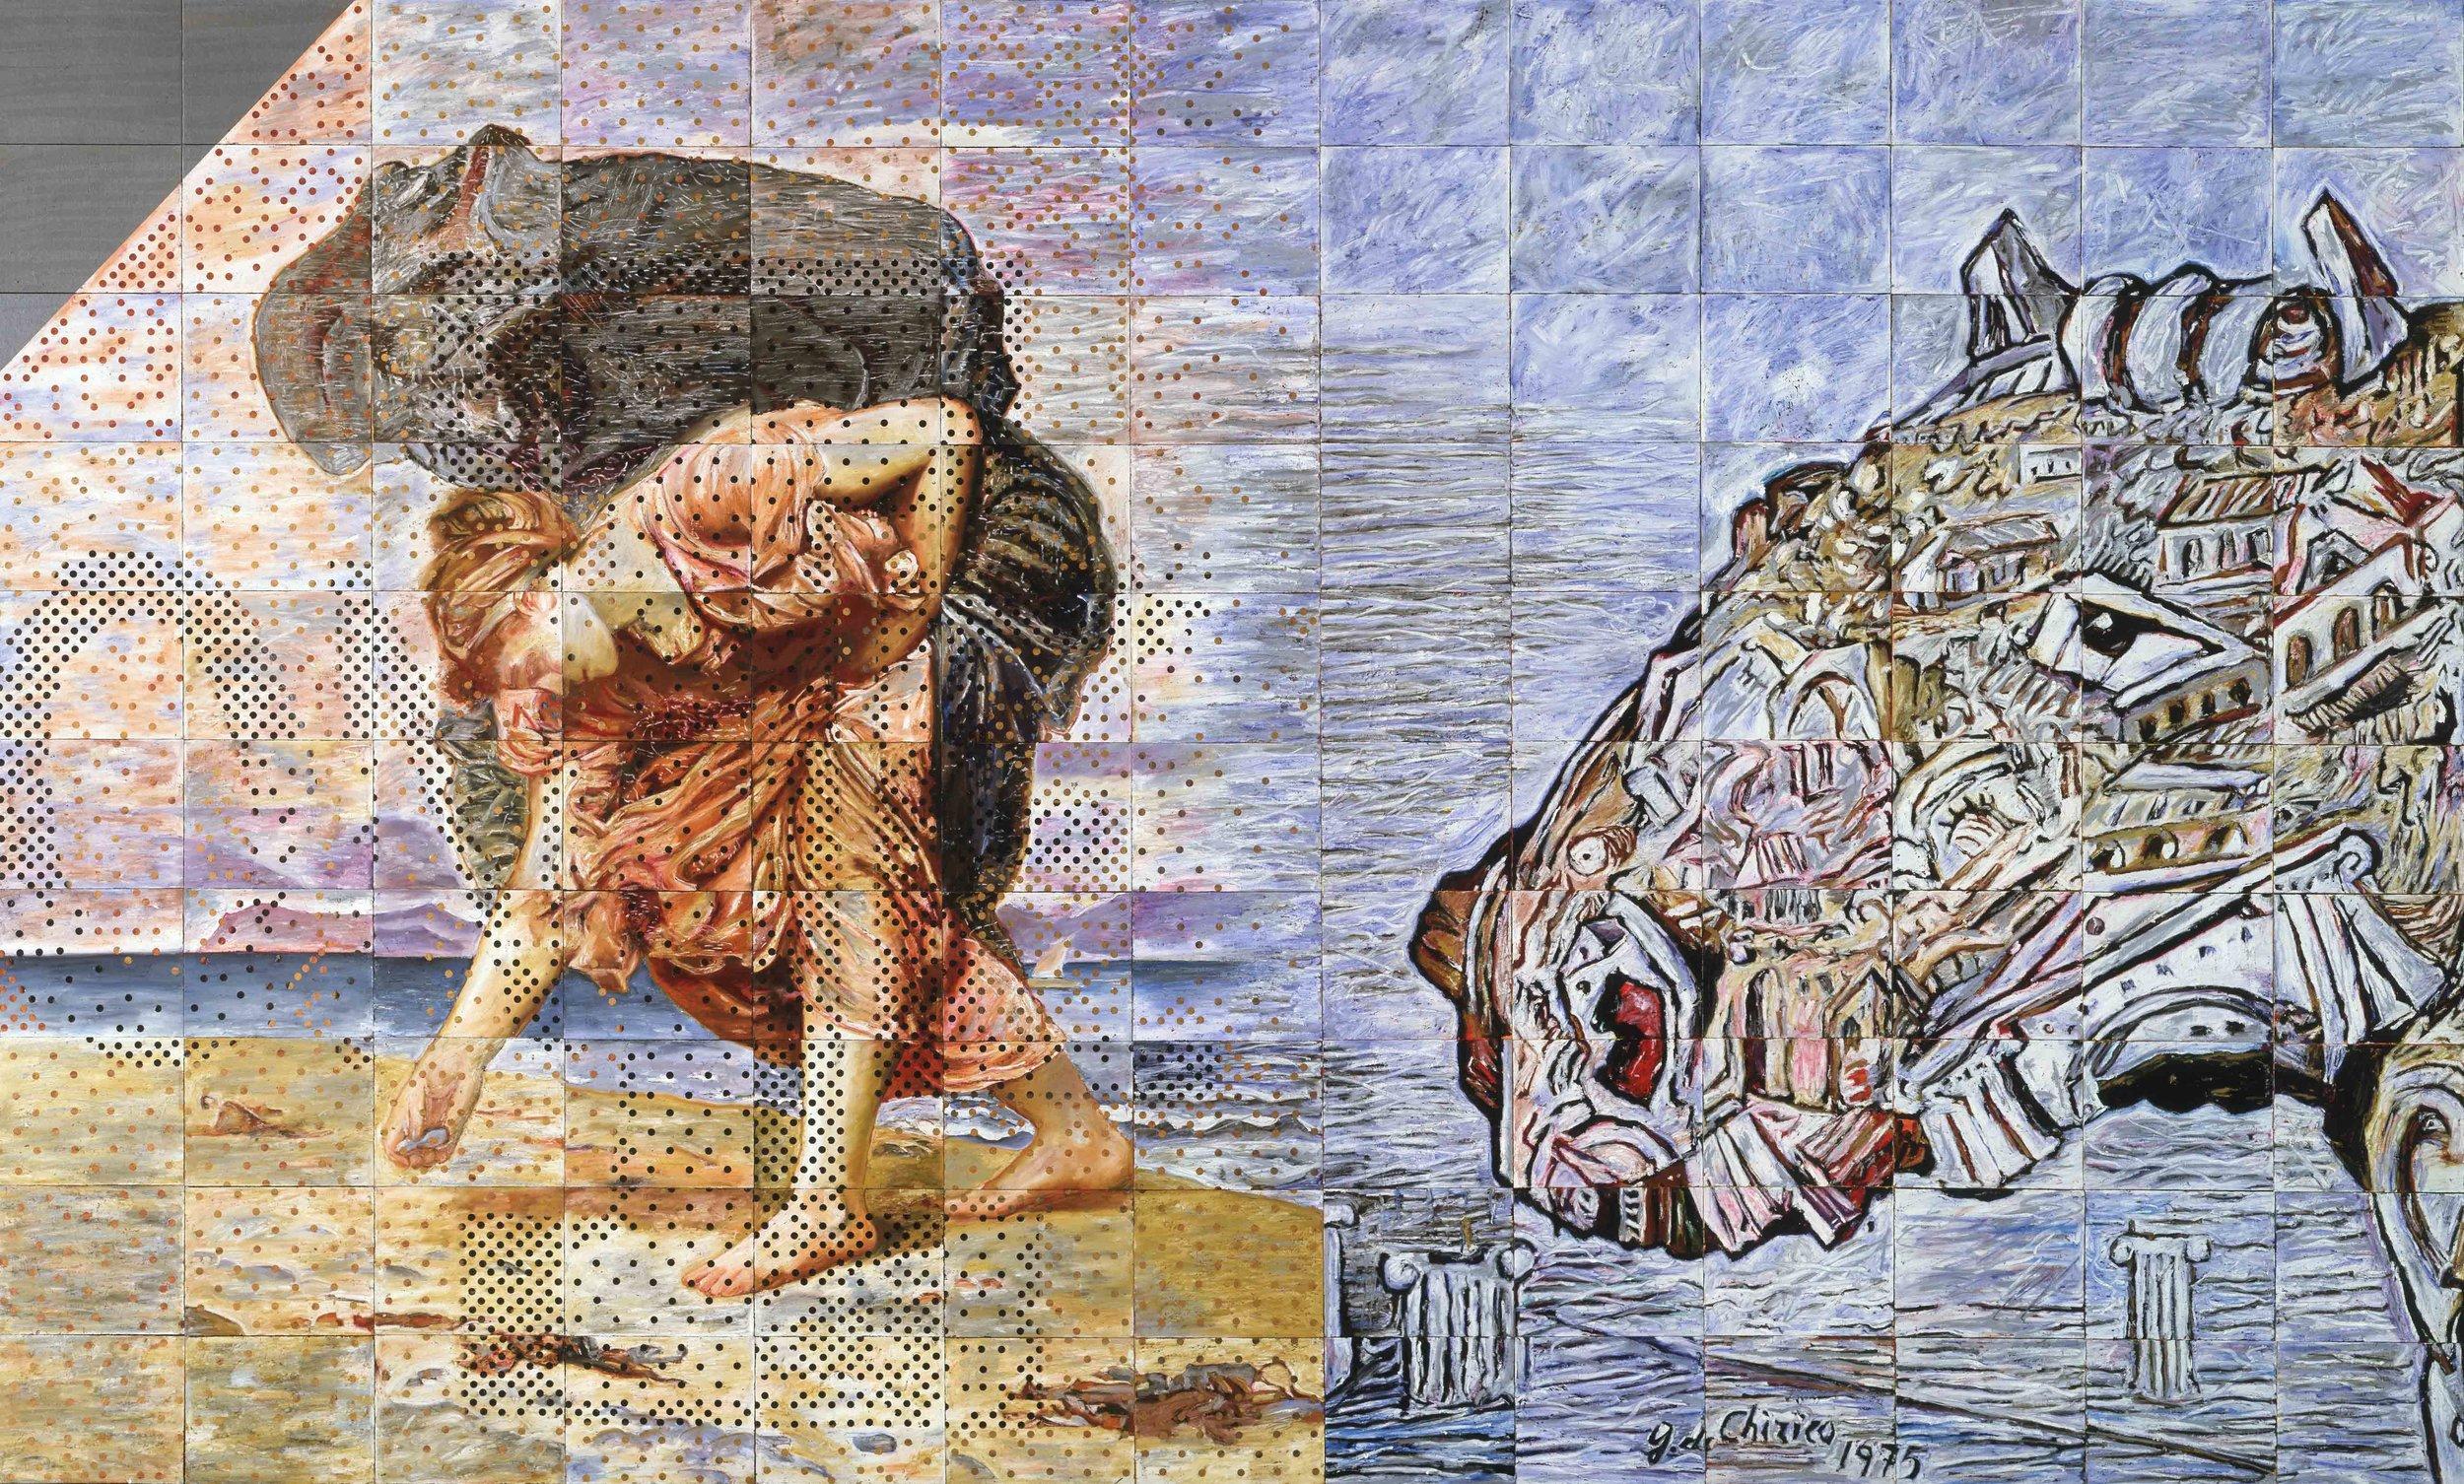 The Hyperborean and the Speluncar, 1986